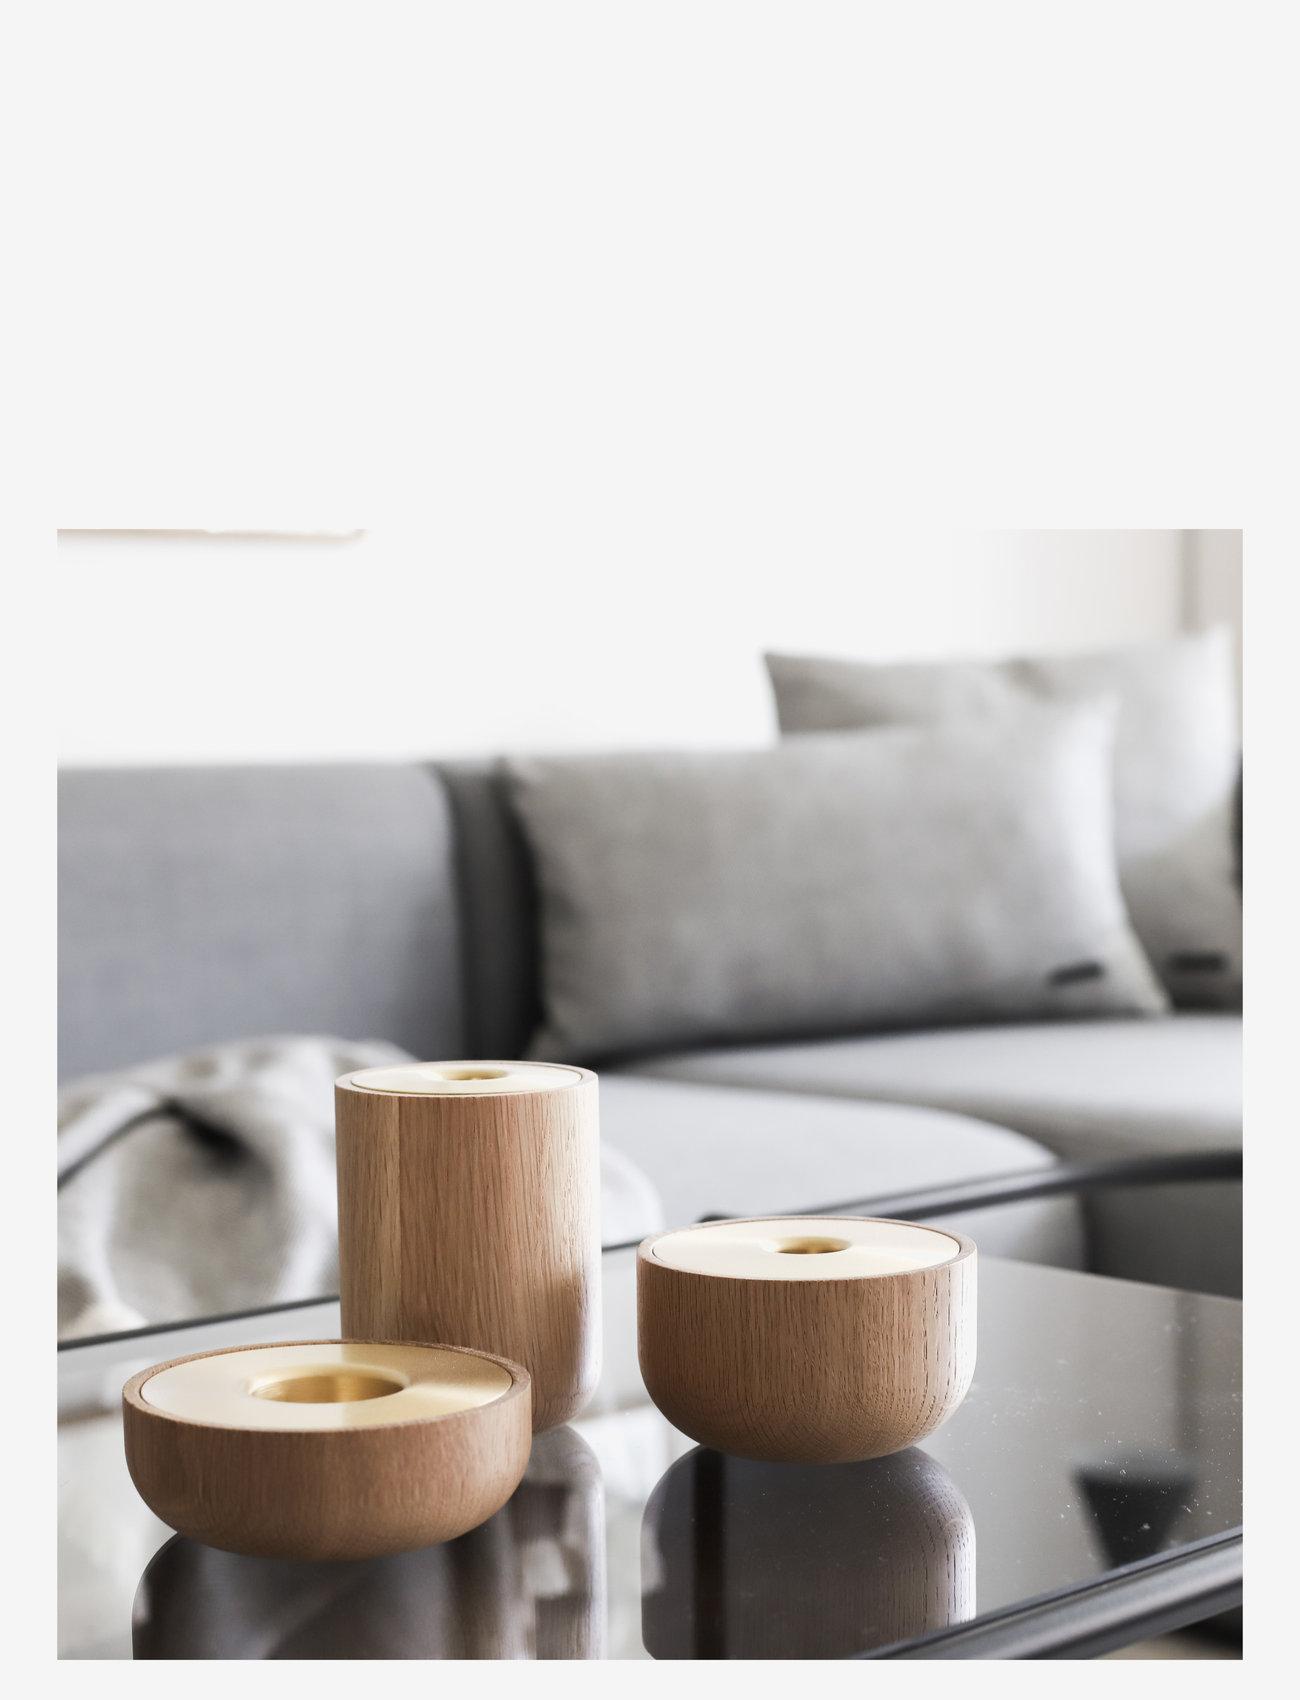 Andersen Furniture - Oak Nordic tea light - lysestaker - no color - 1